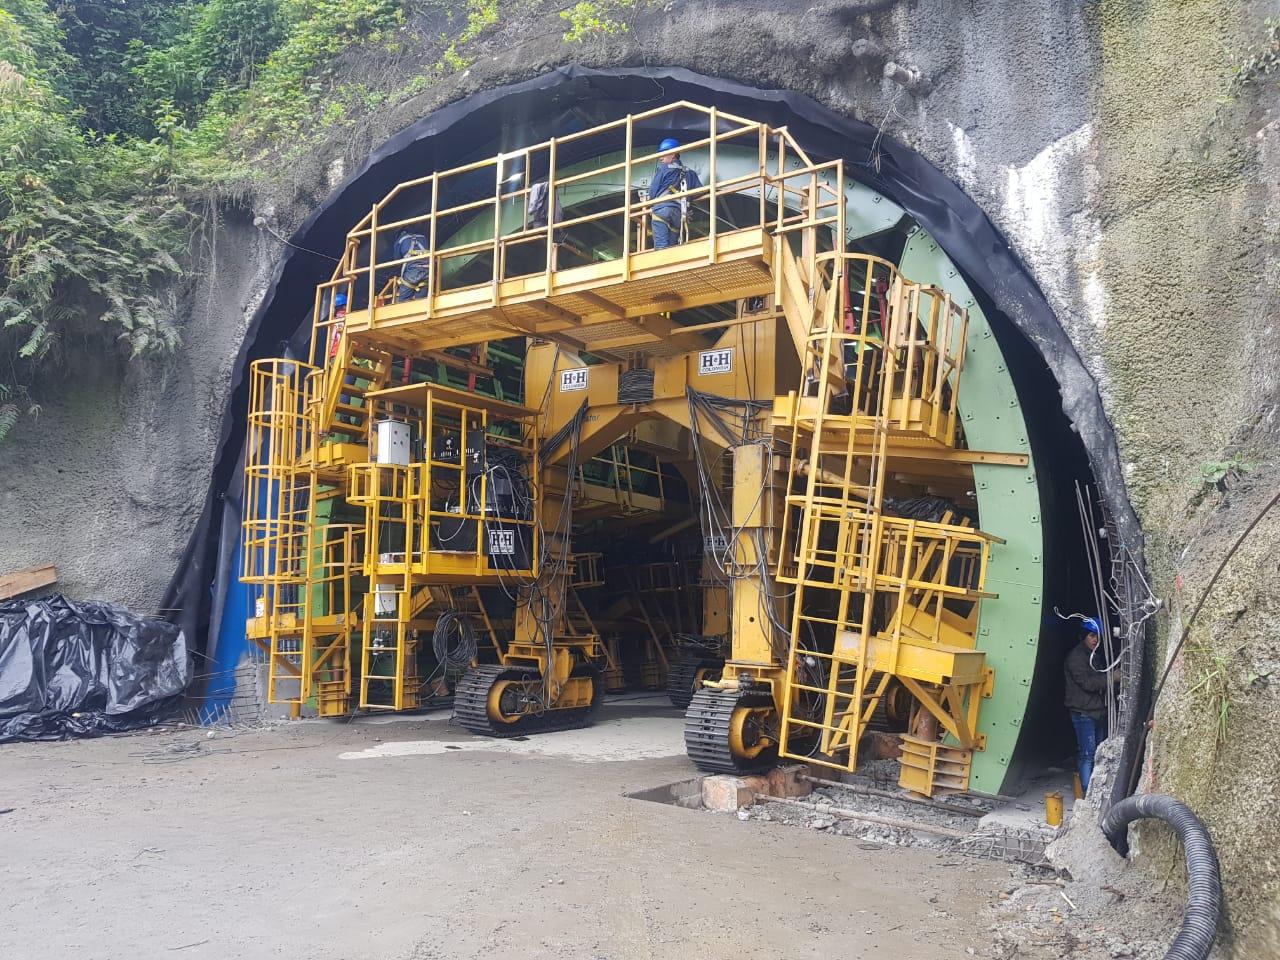 Encofrado para túnel en mina La línea - Carmelitas by RÚBRICA TUNNELS